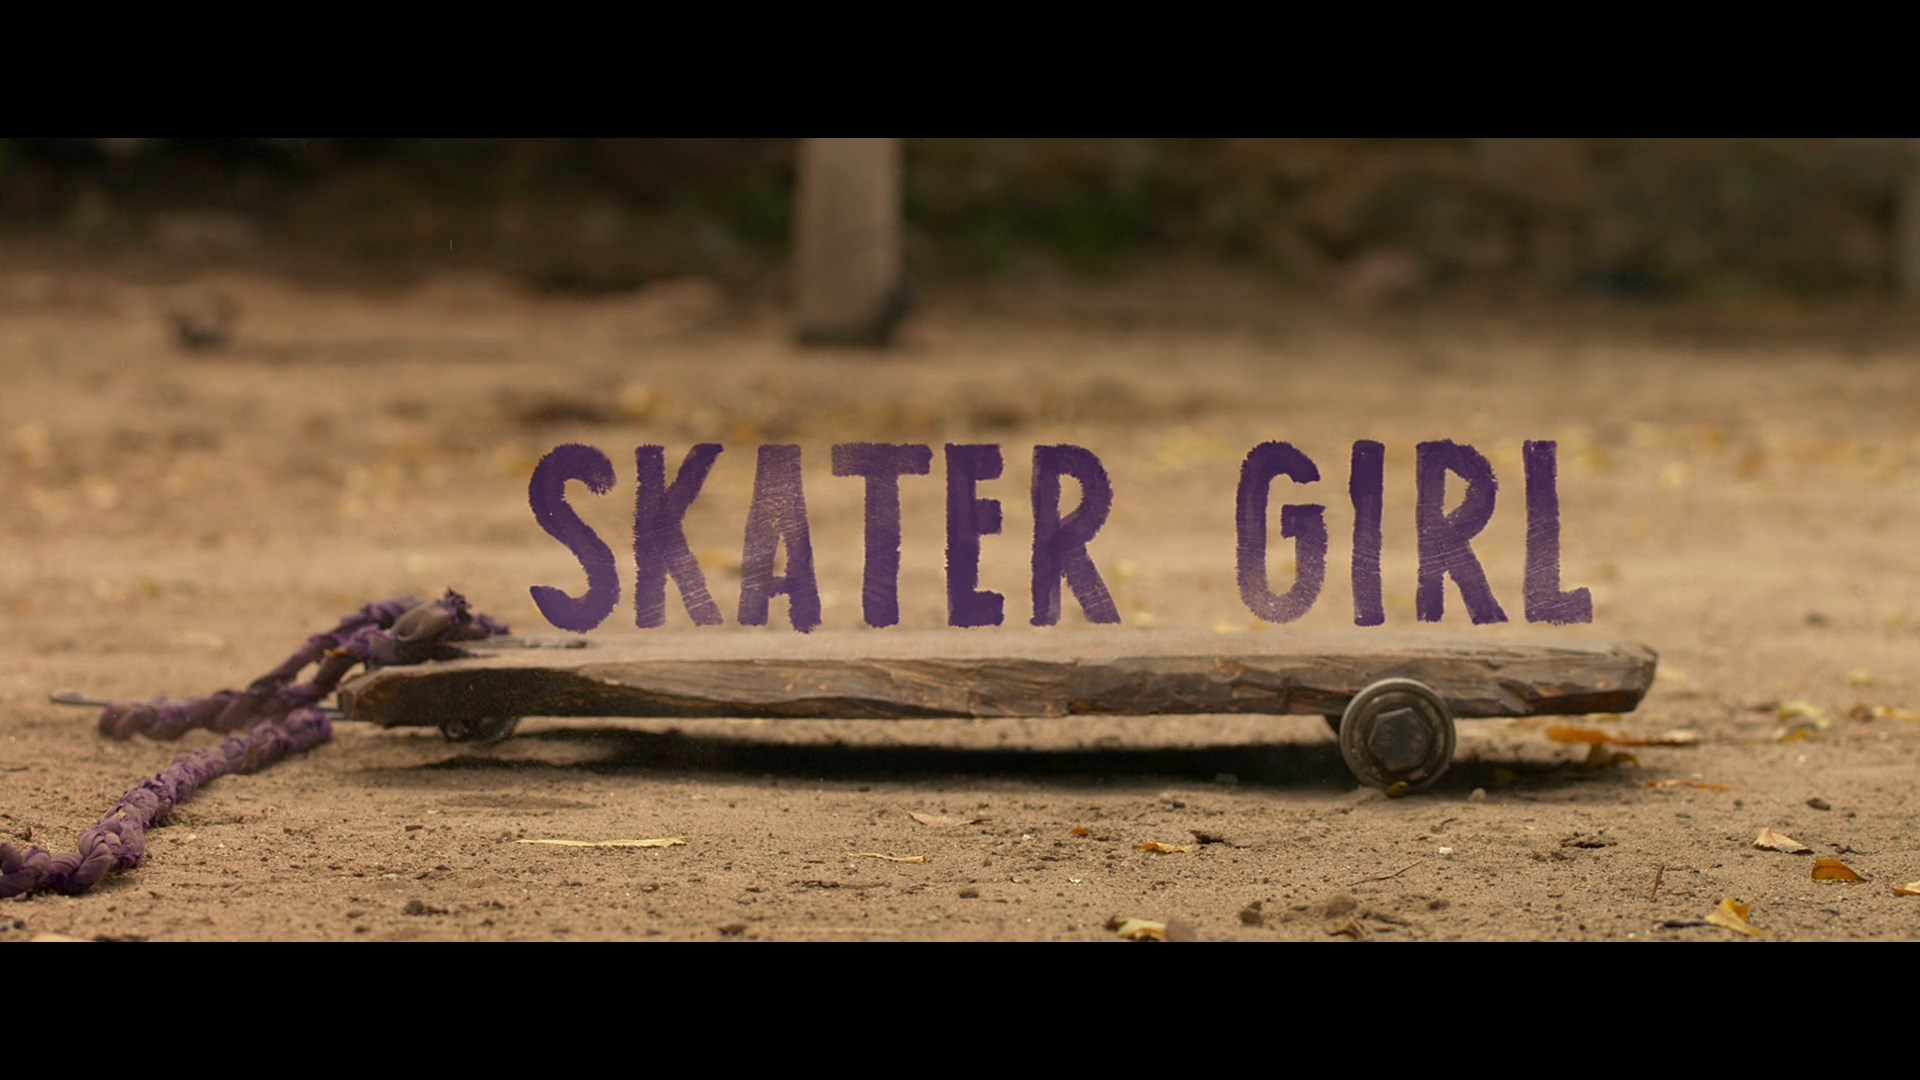 Chica skater (2021) 1080p WEB-DL Latino